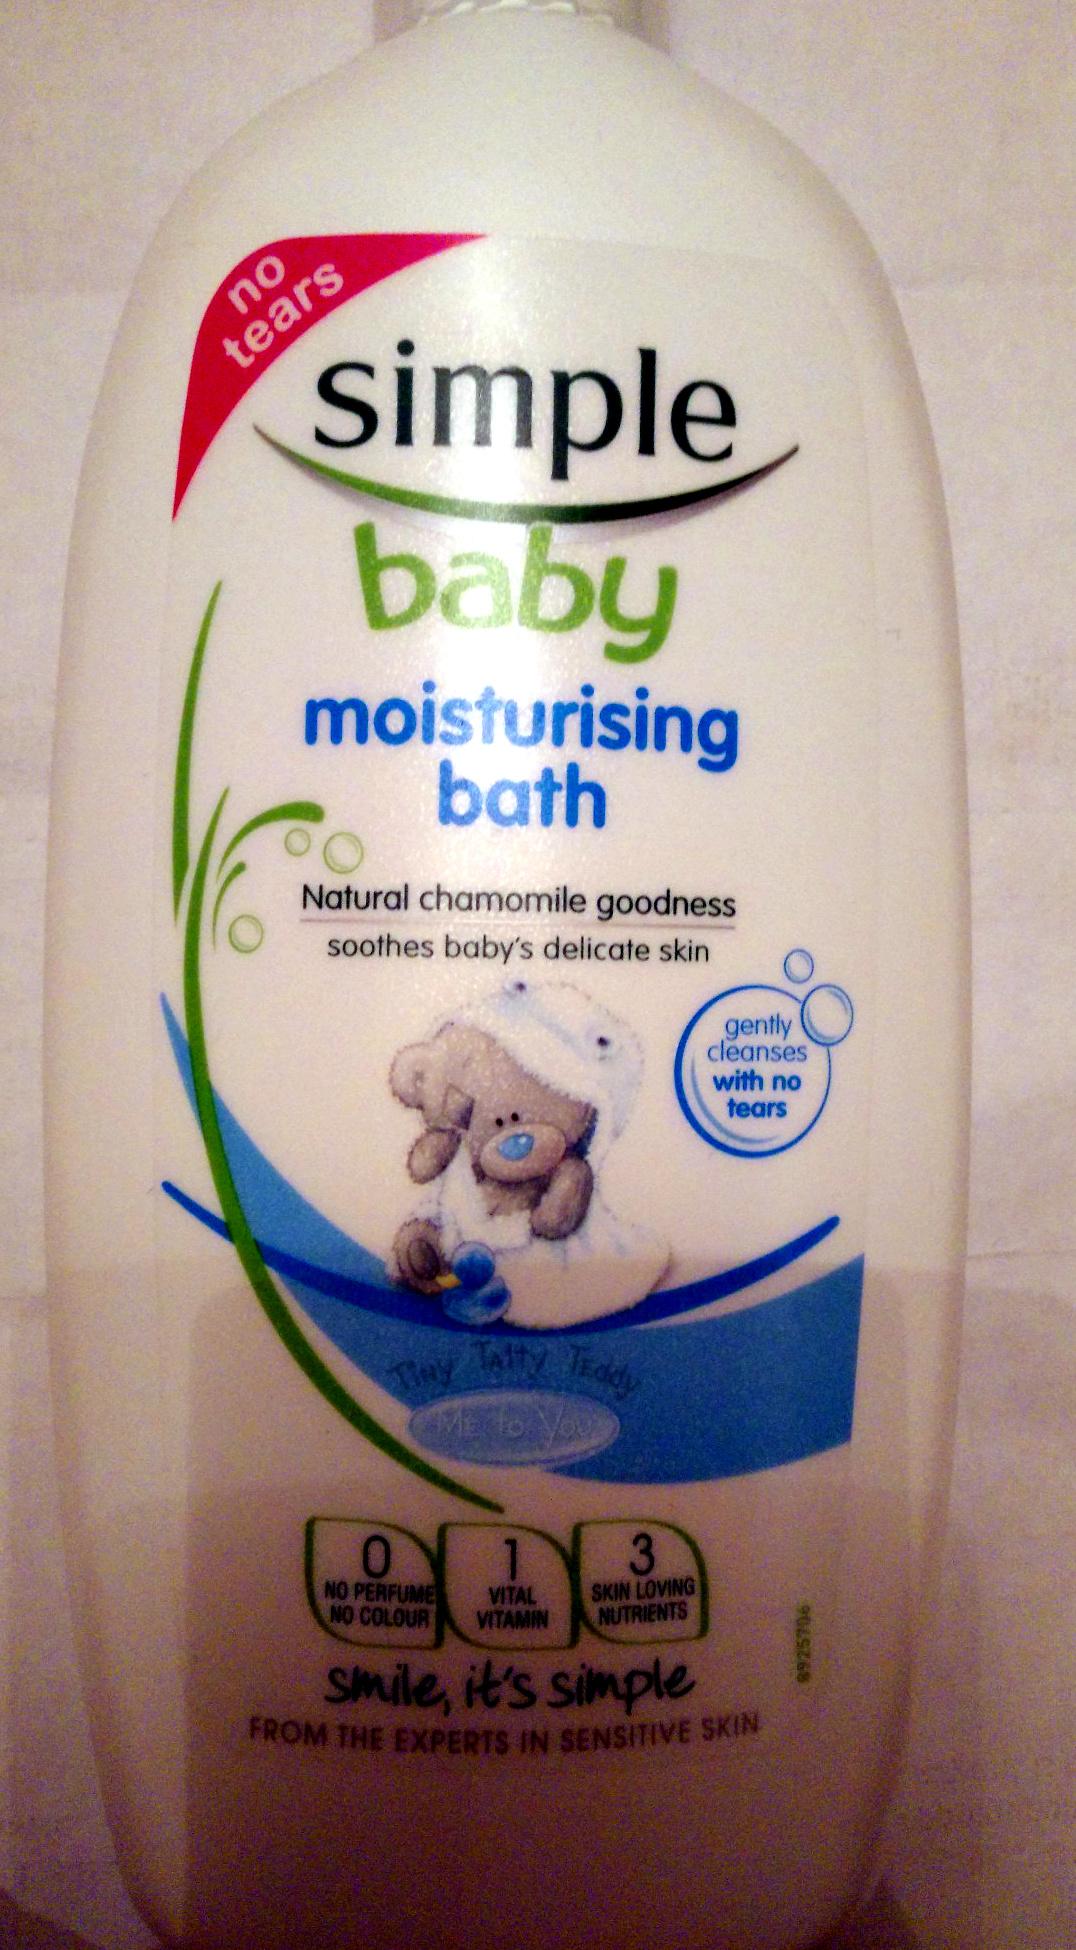 Baby Moisturising Bath - Product